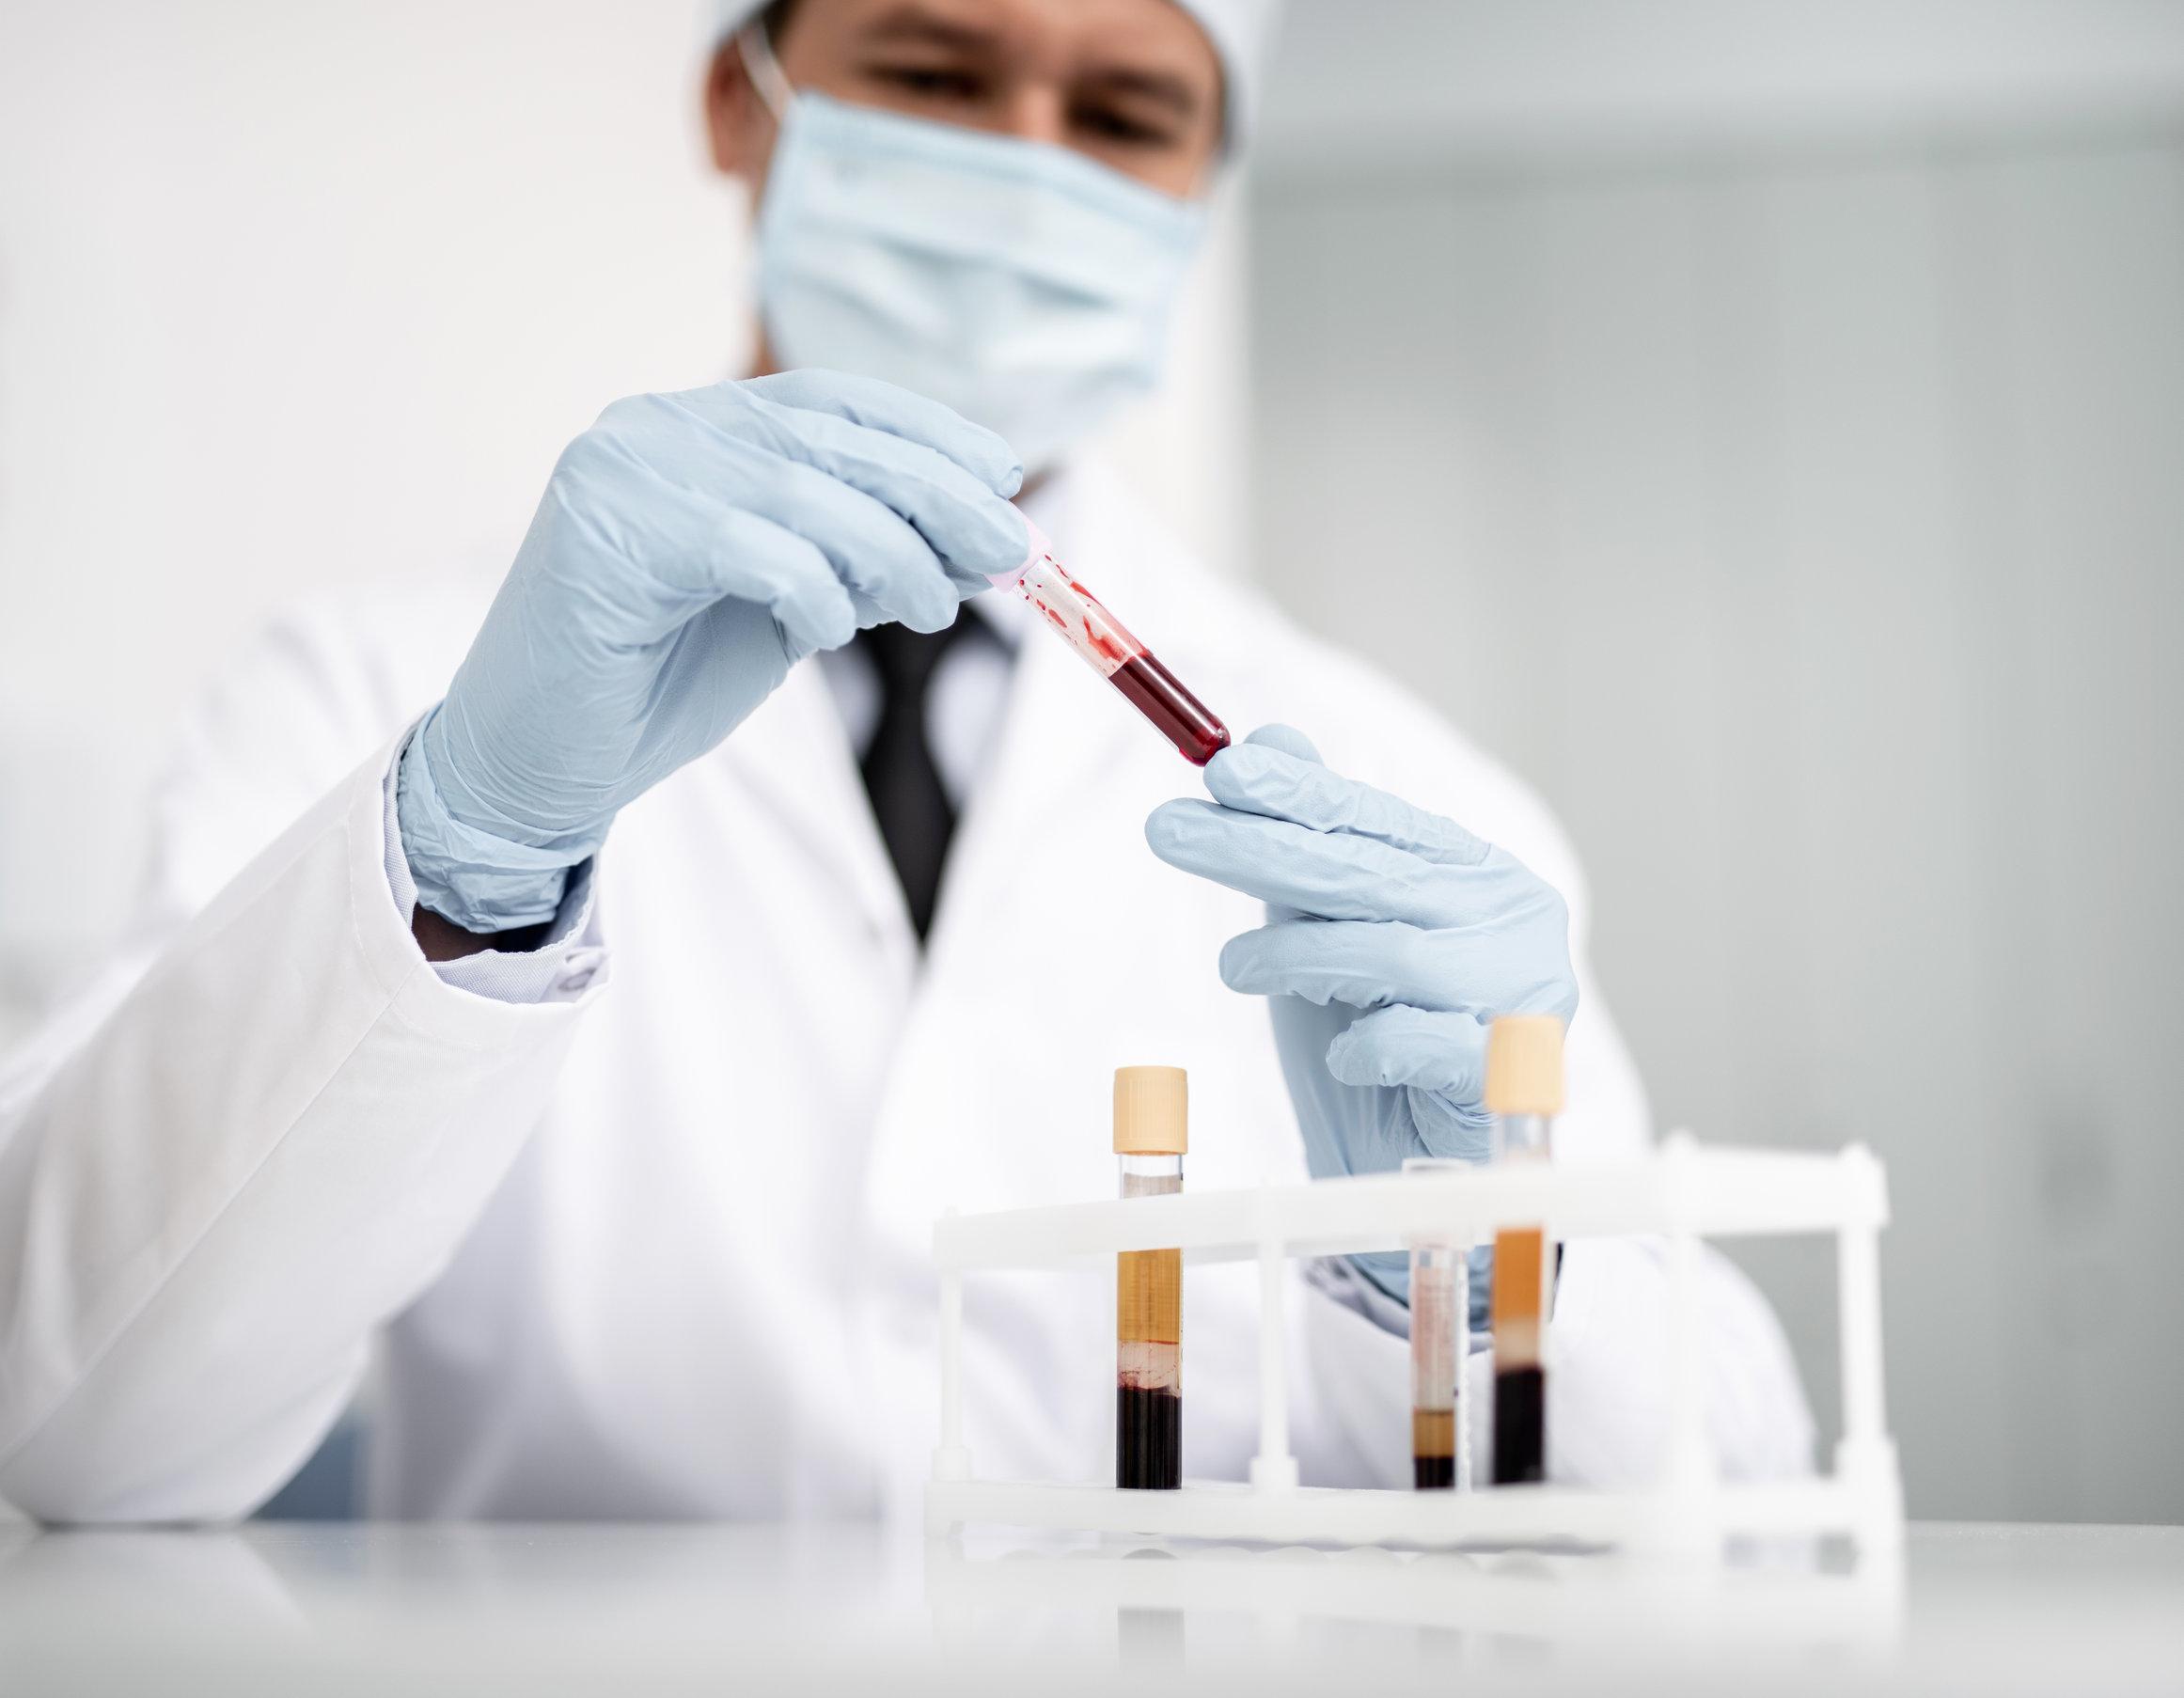 análisis de sangre normal detecta cáncer